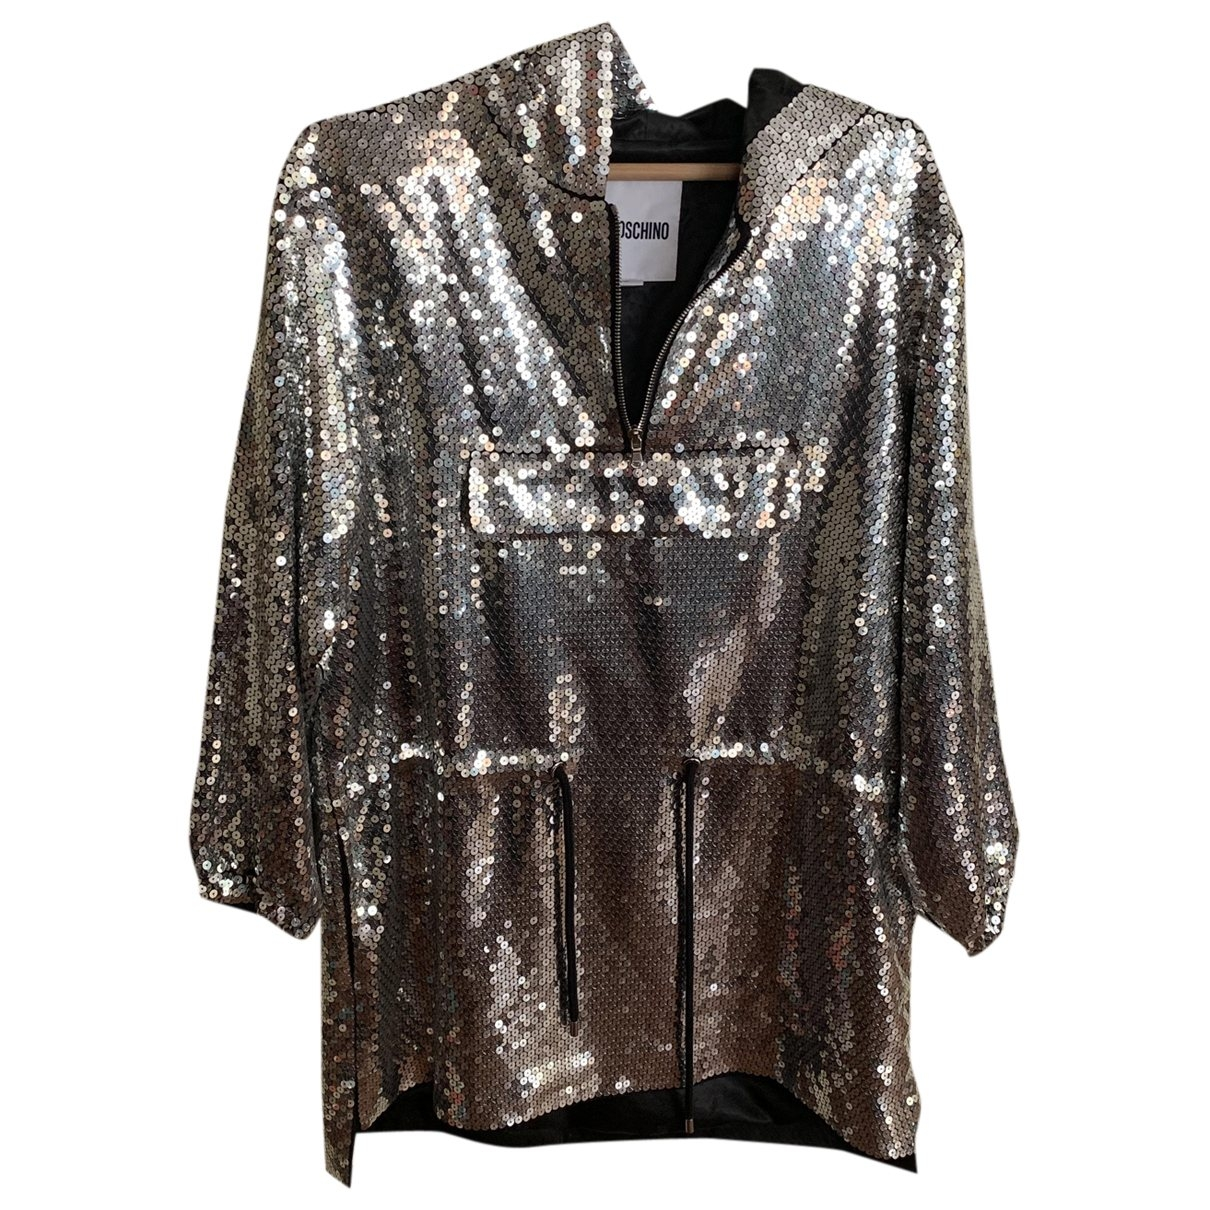 Moschino For H&m \N Metallic Glitter jacket for Women 36 FR